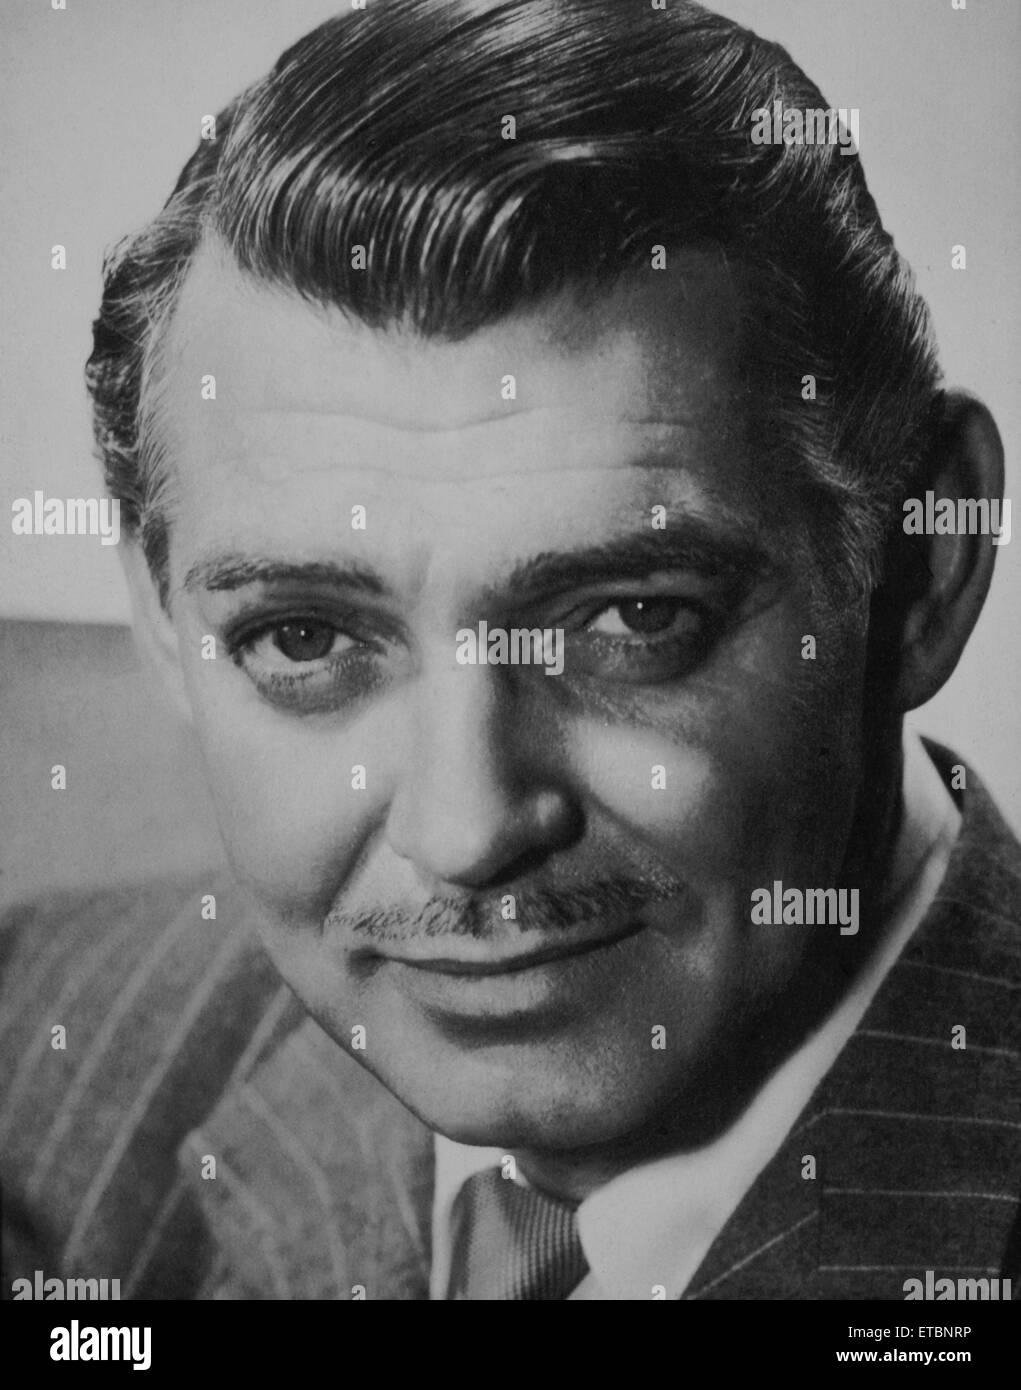 Actor Clark Gable, Portrait, 1948 - Stock Image